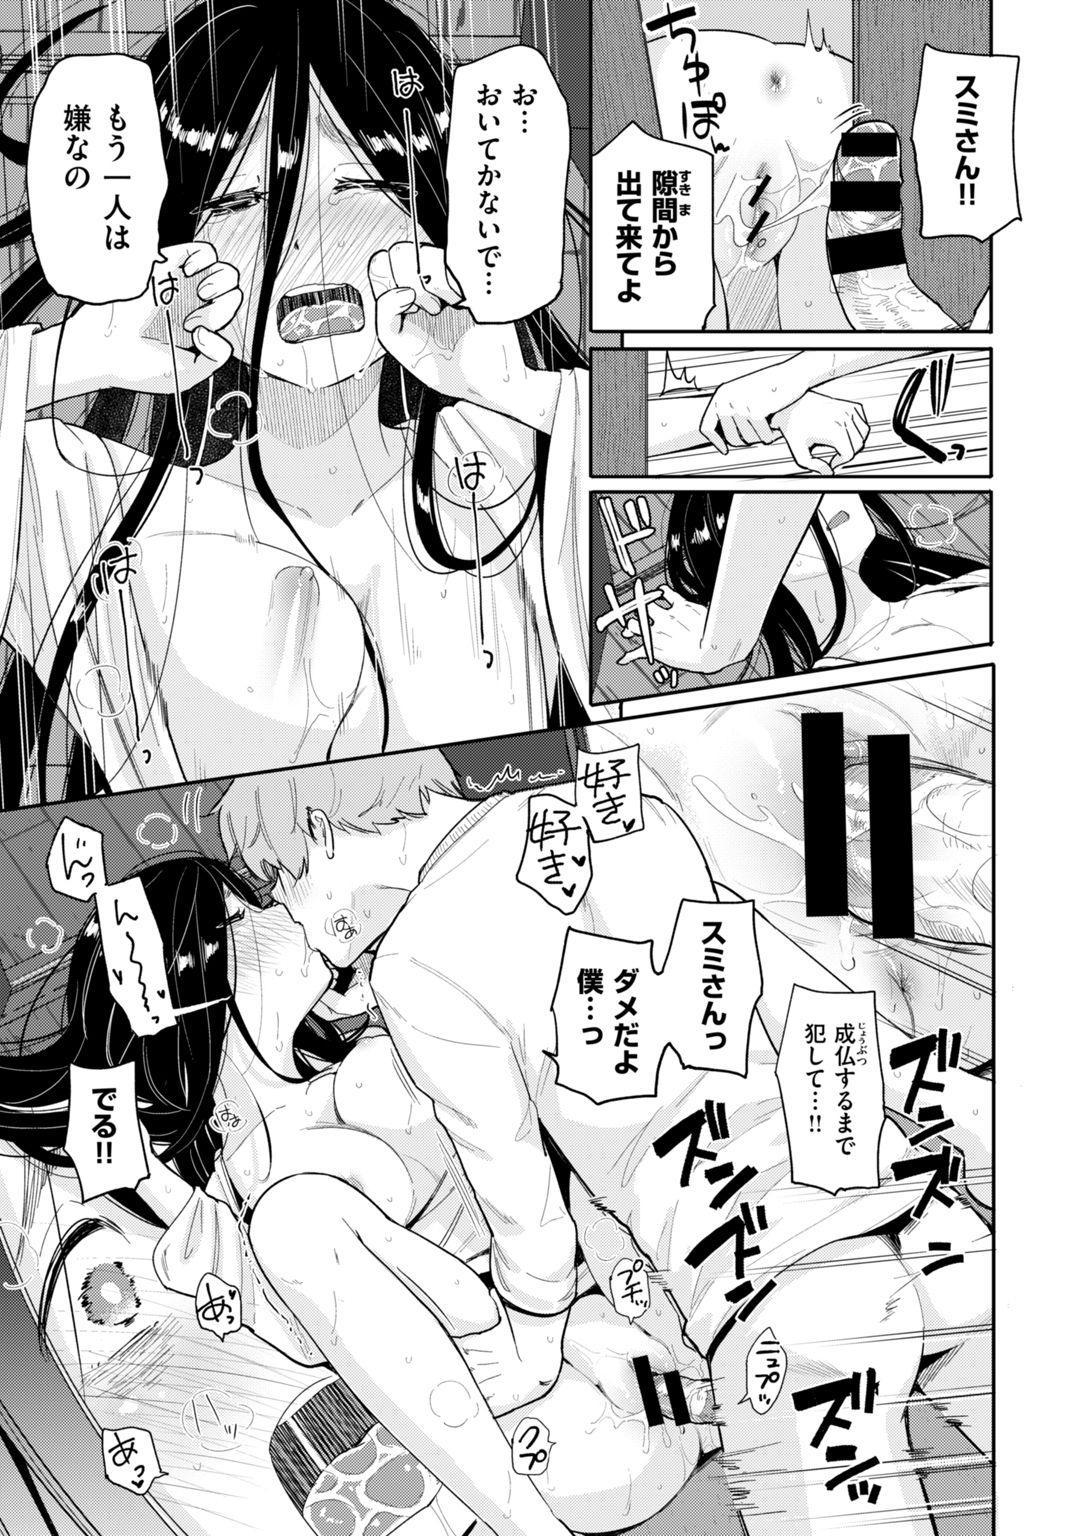 COMIC HAPPINING Vol. 2 93